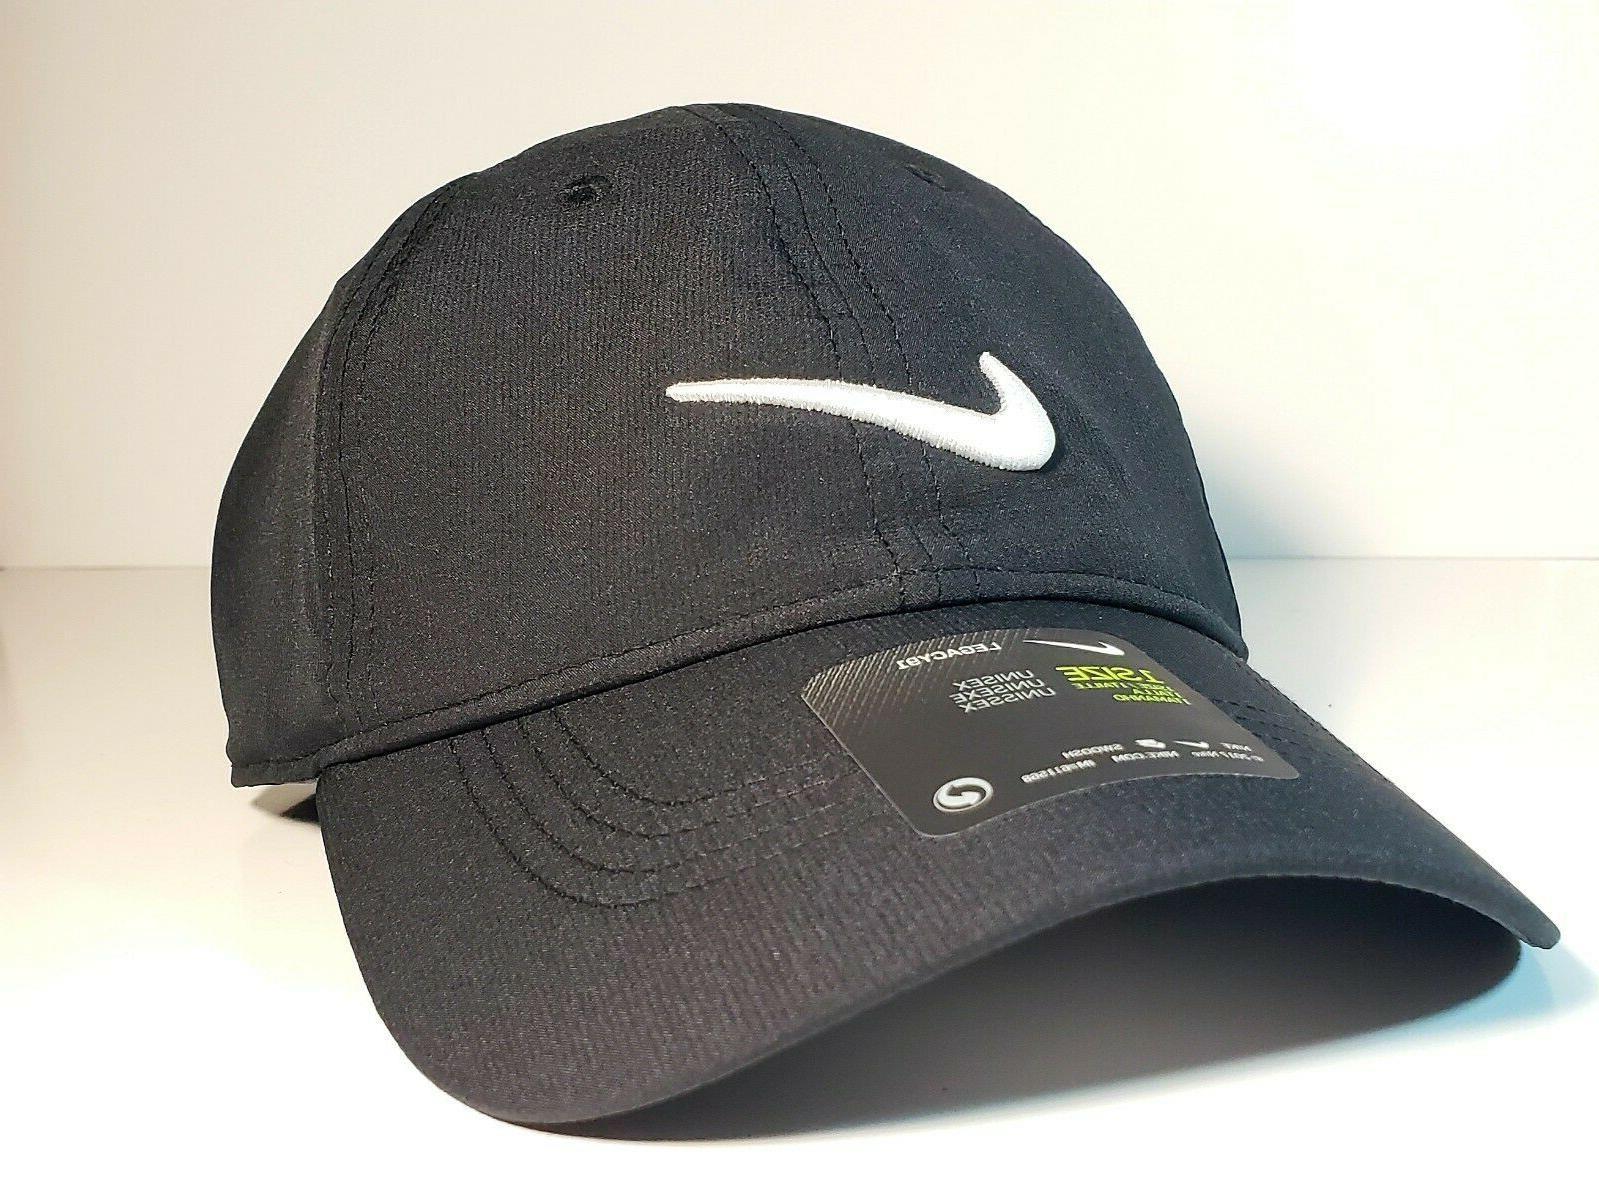 2019 Legacy 91 Cap free shipping